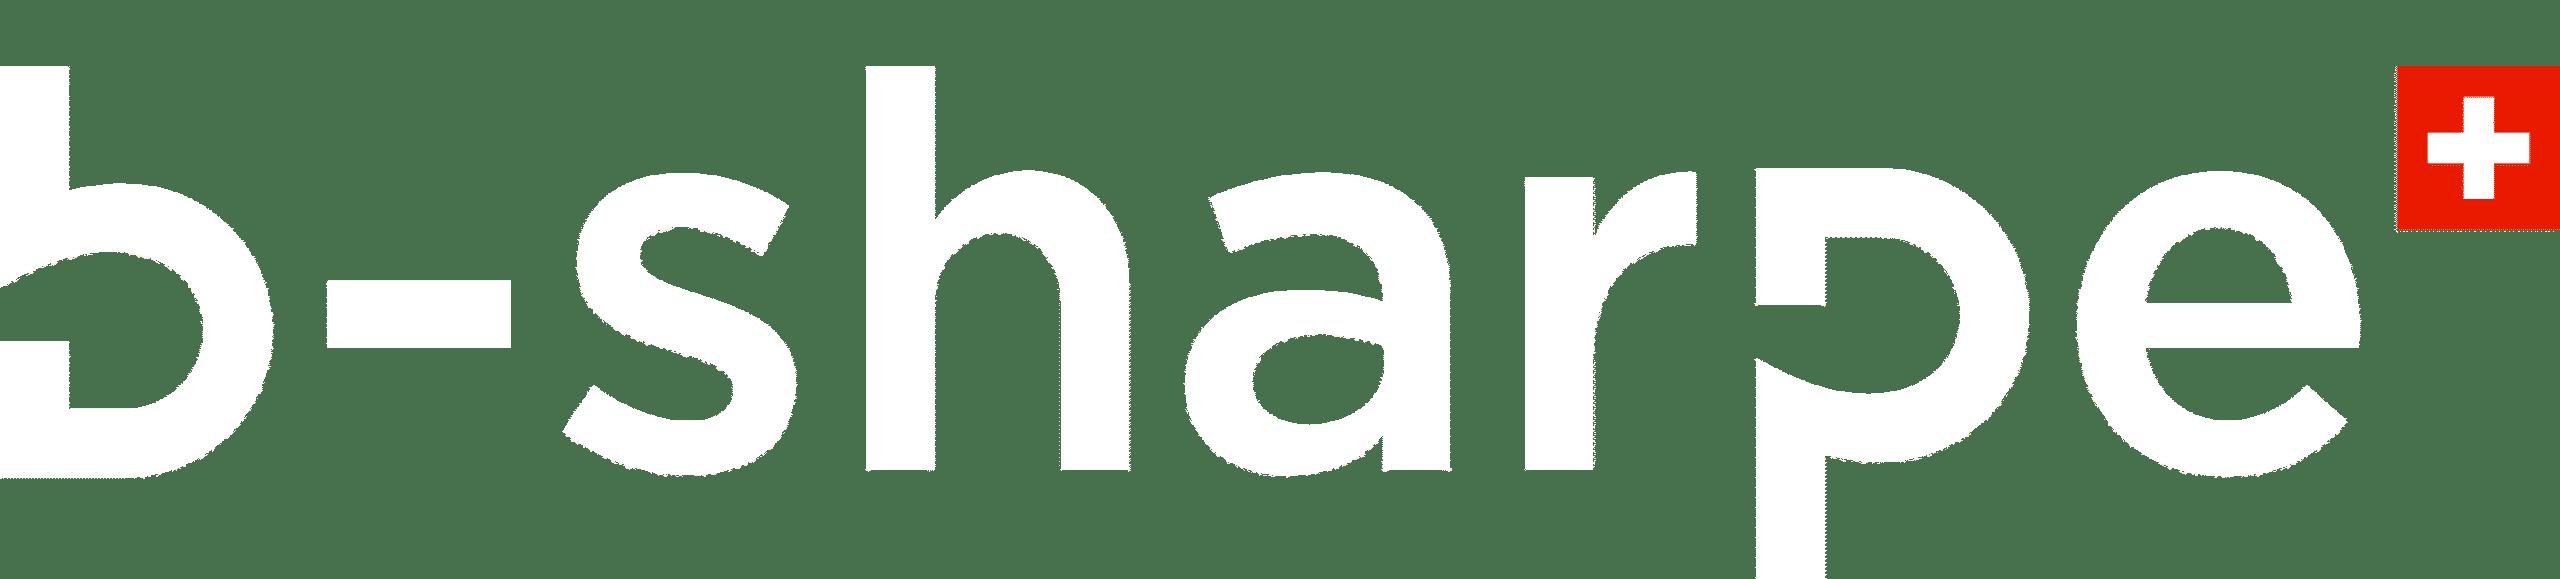 b-sharpe_Brand_Logo_Web_Blue_2019_3000x600px